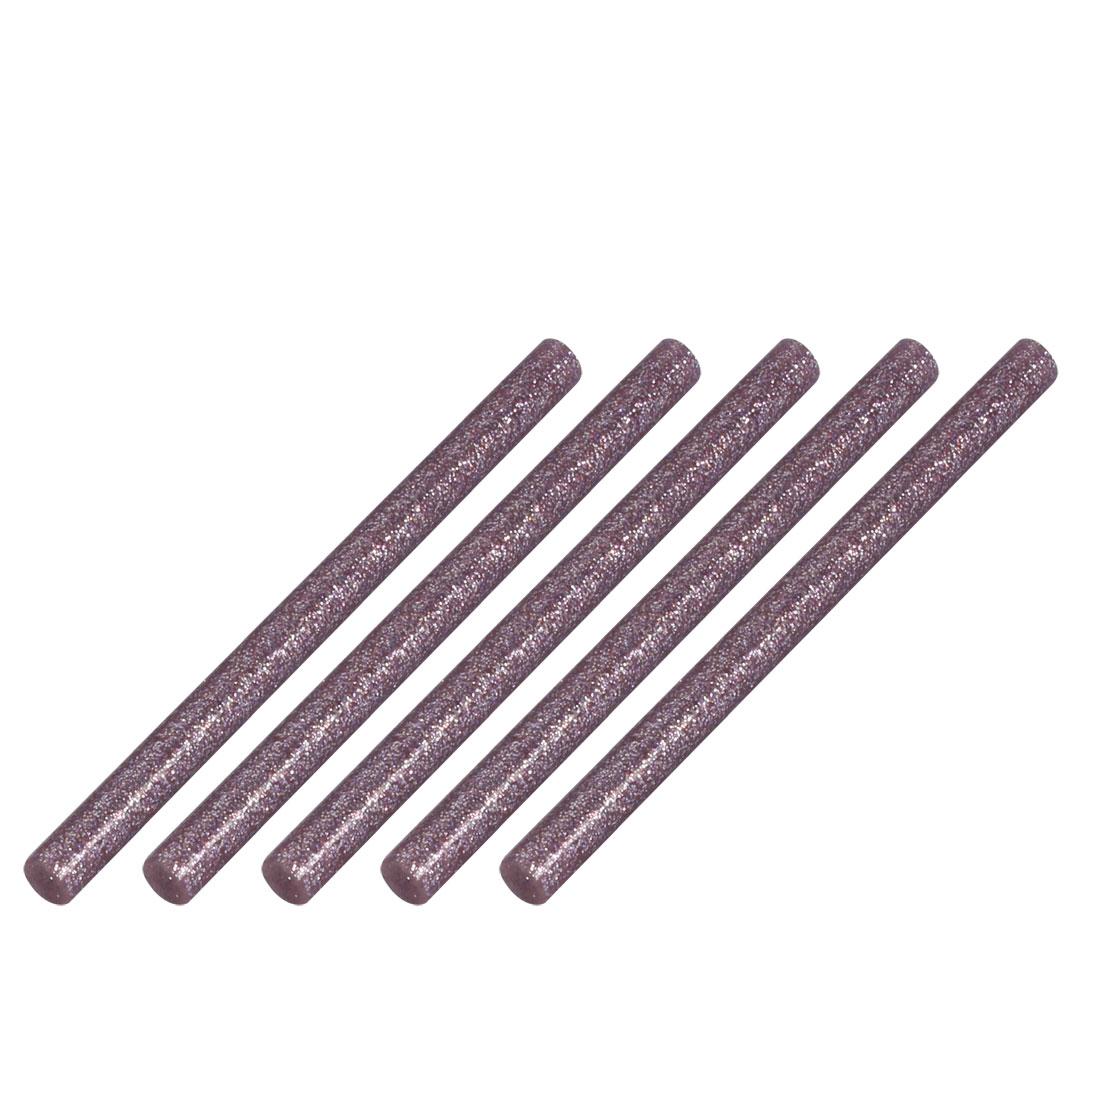 5pcs 7mm Dia 100mm Long Hot Melt Glue Adhesive Stick Light Purple